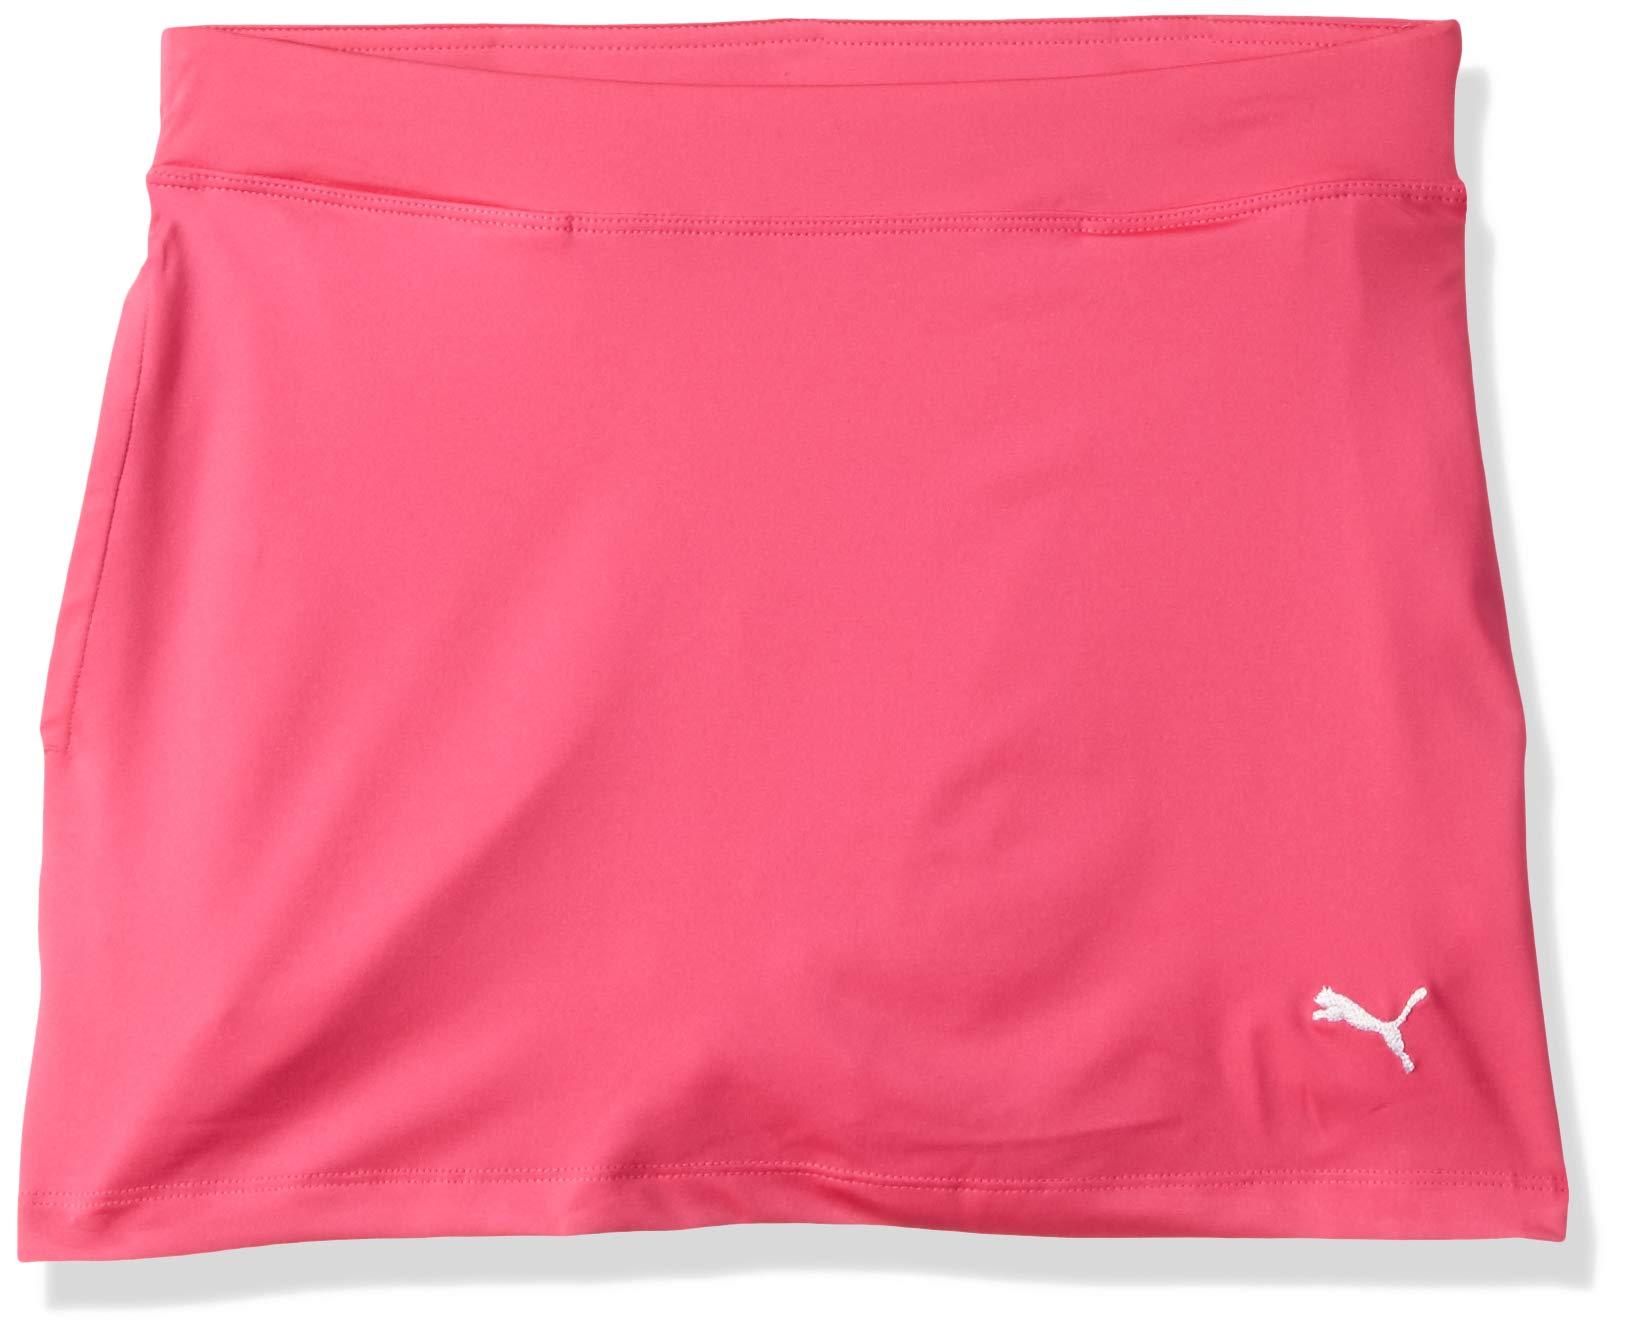 Puma Golf Girls 2019 Solid Knit Skirt, Fuchsia Purple, Large by PUMA